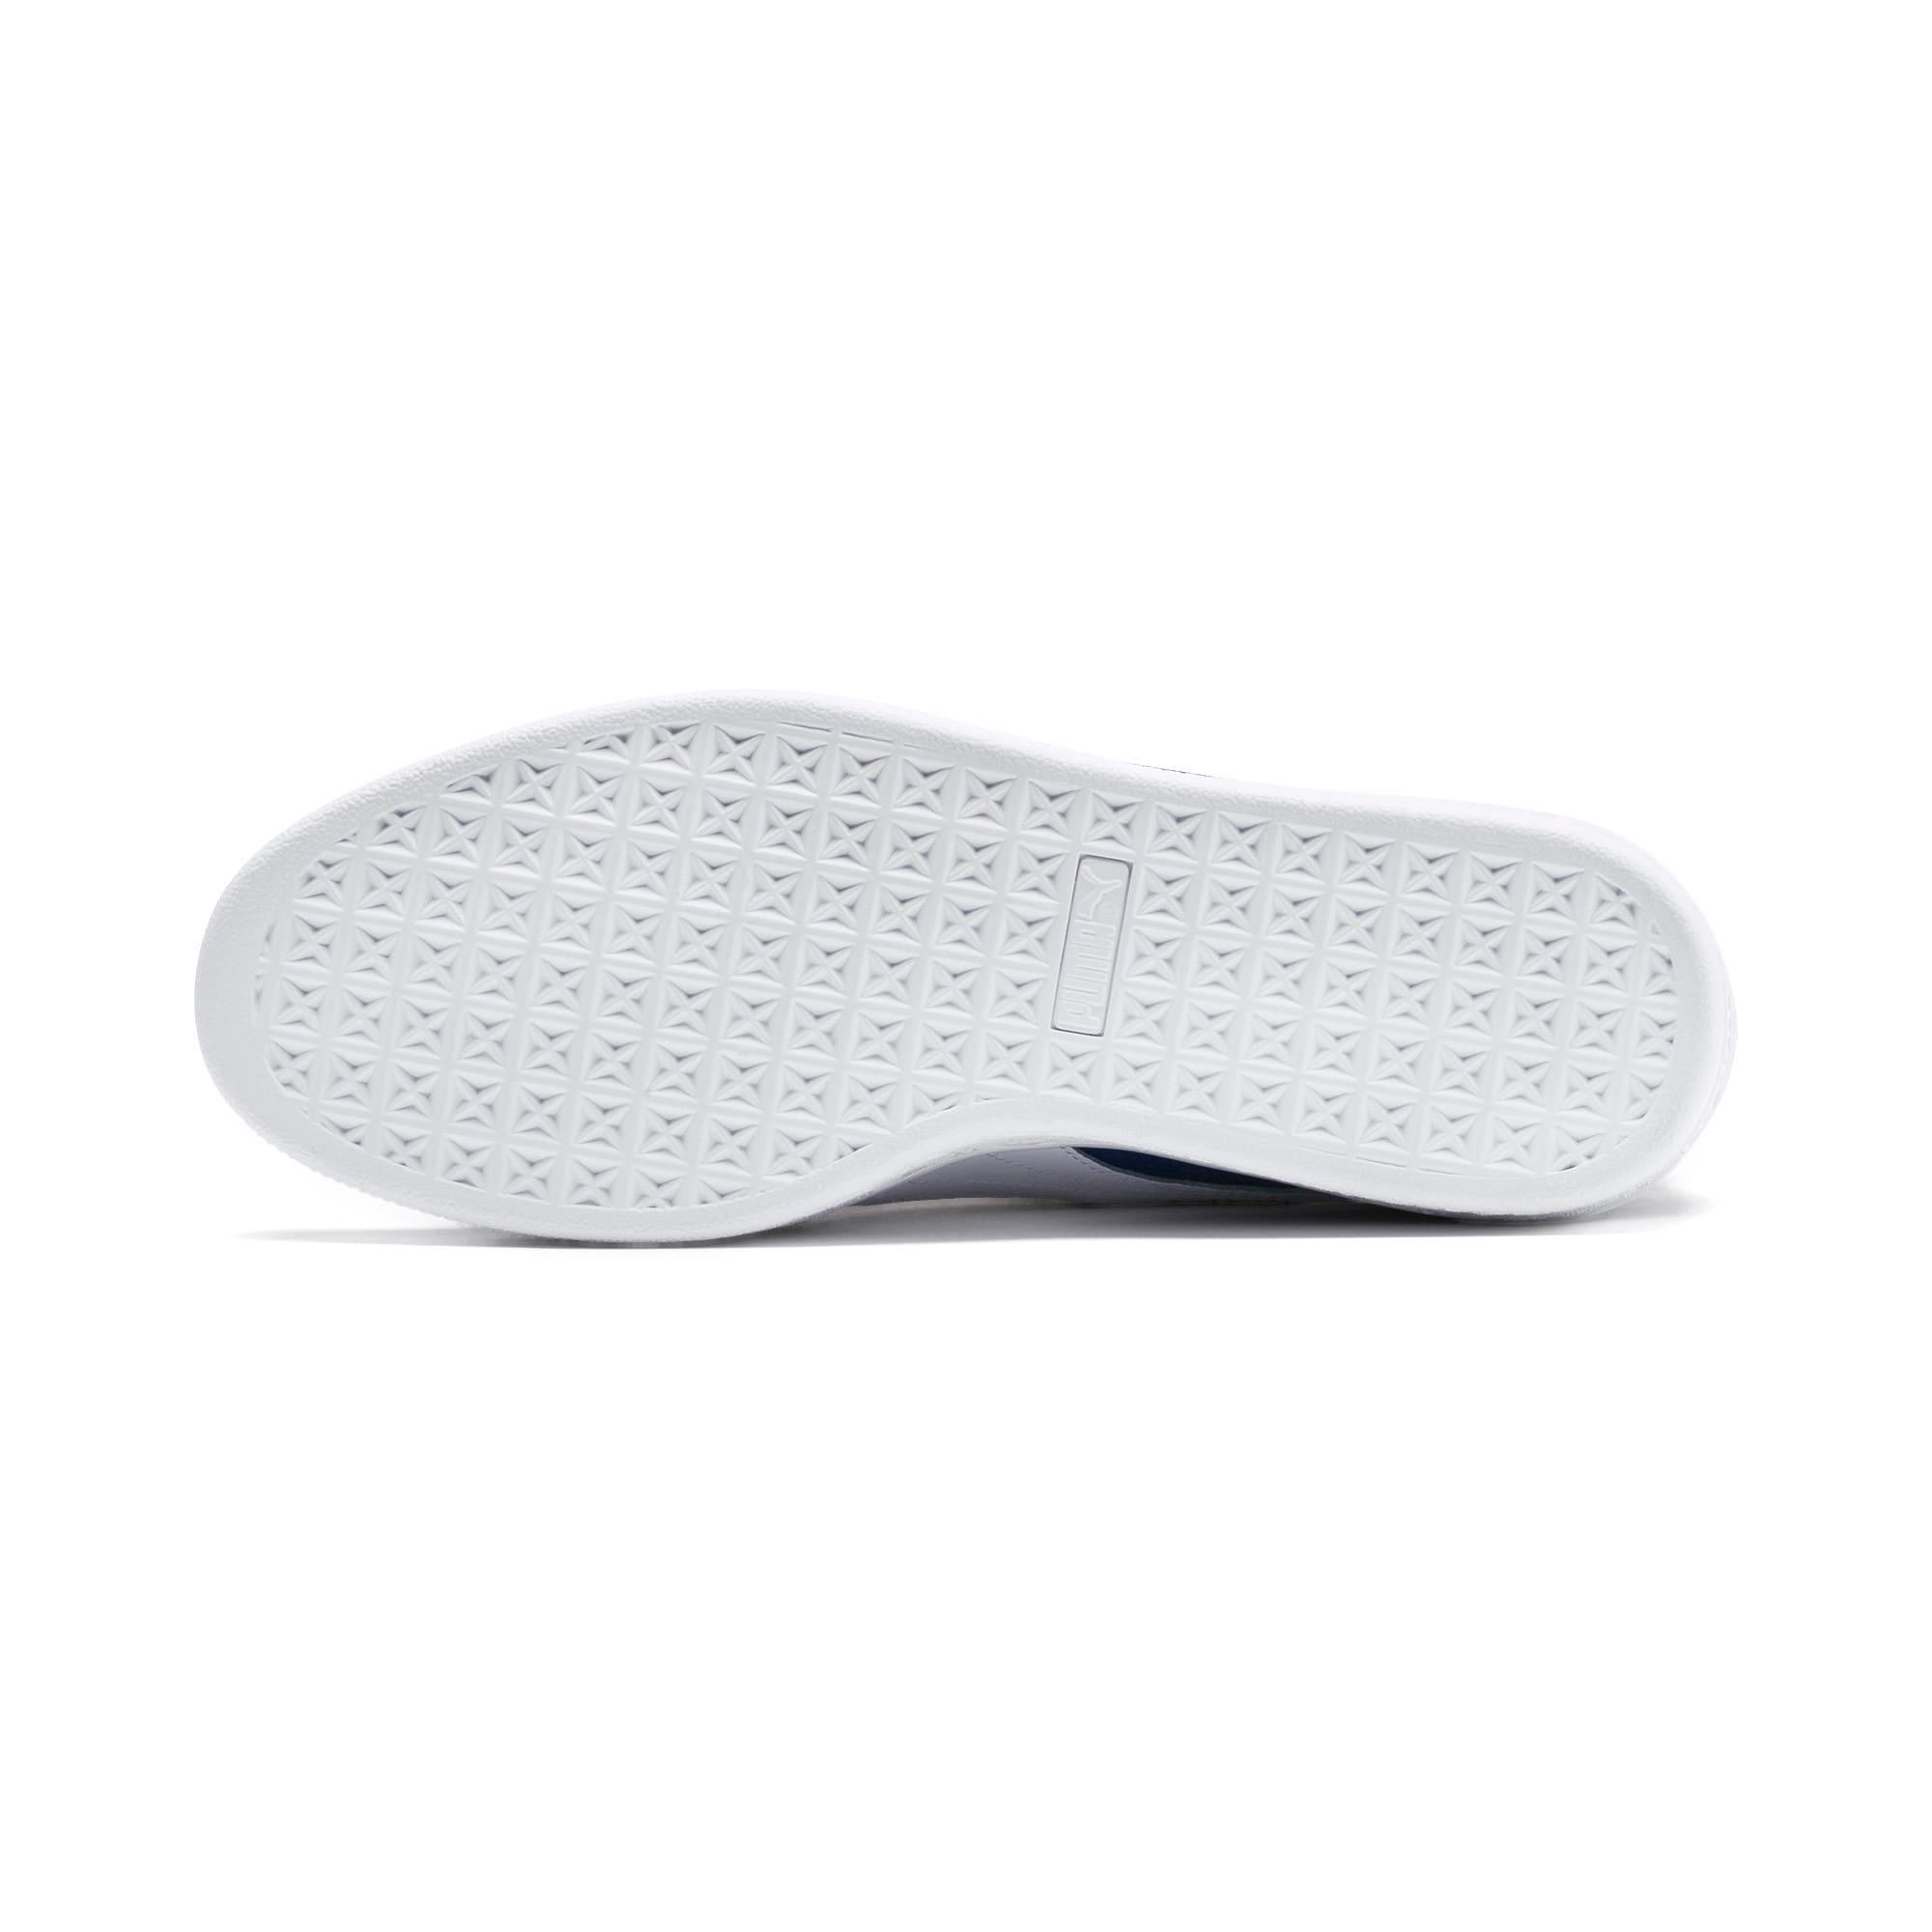 Thumbnail 5 of Suede Classic Block Sneakers, Rhubarb- Blue-White, medium